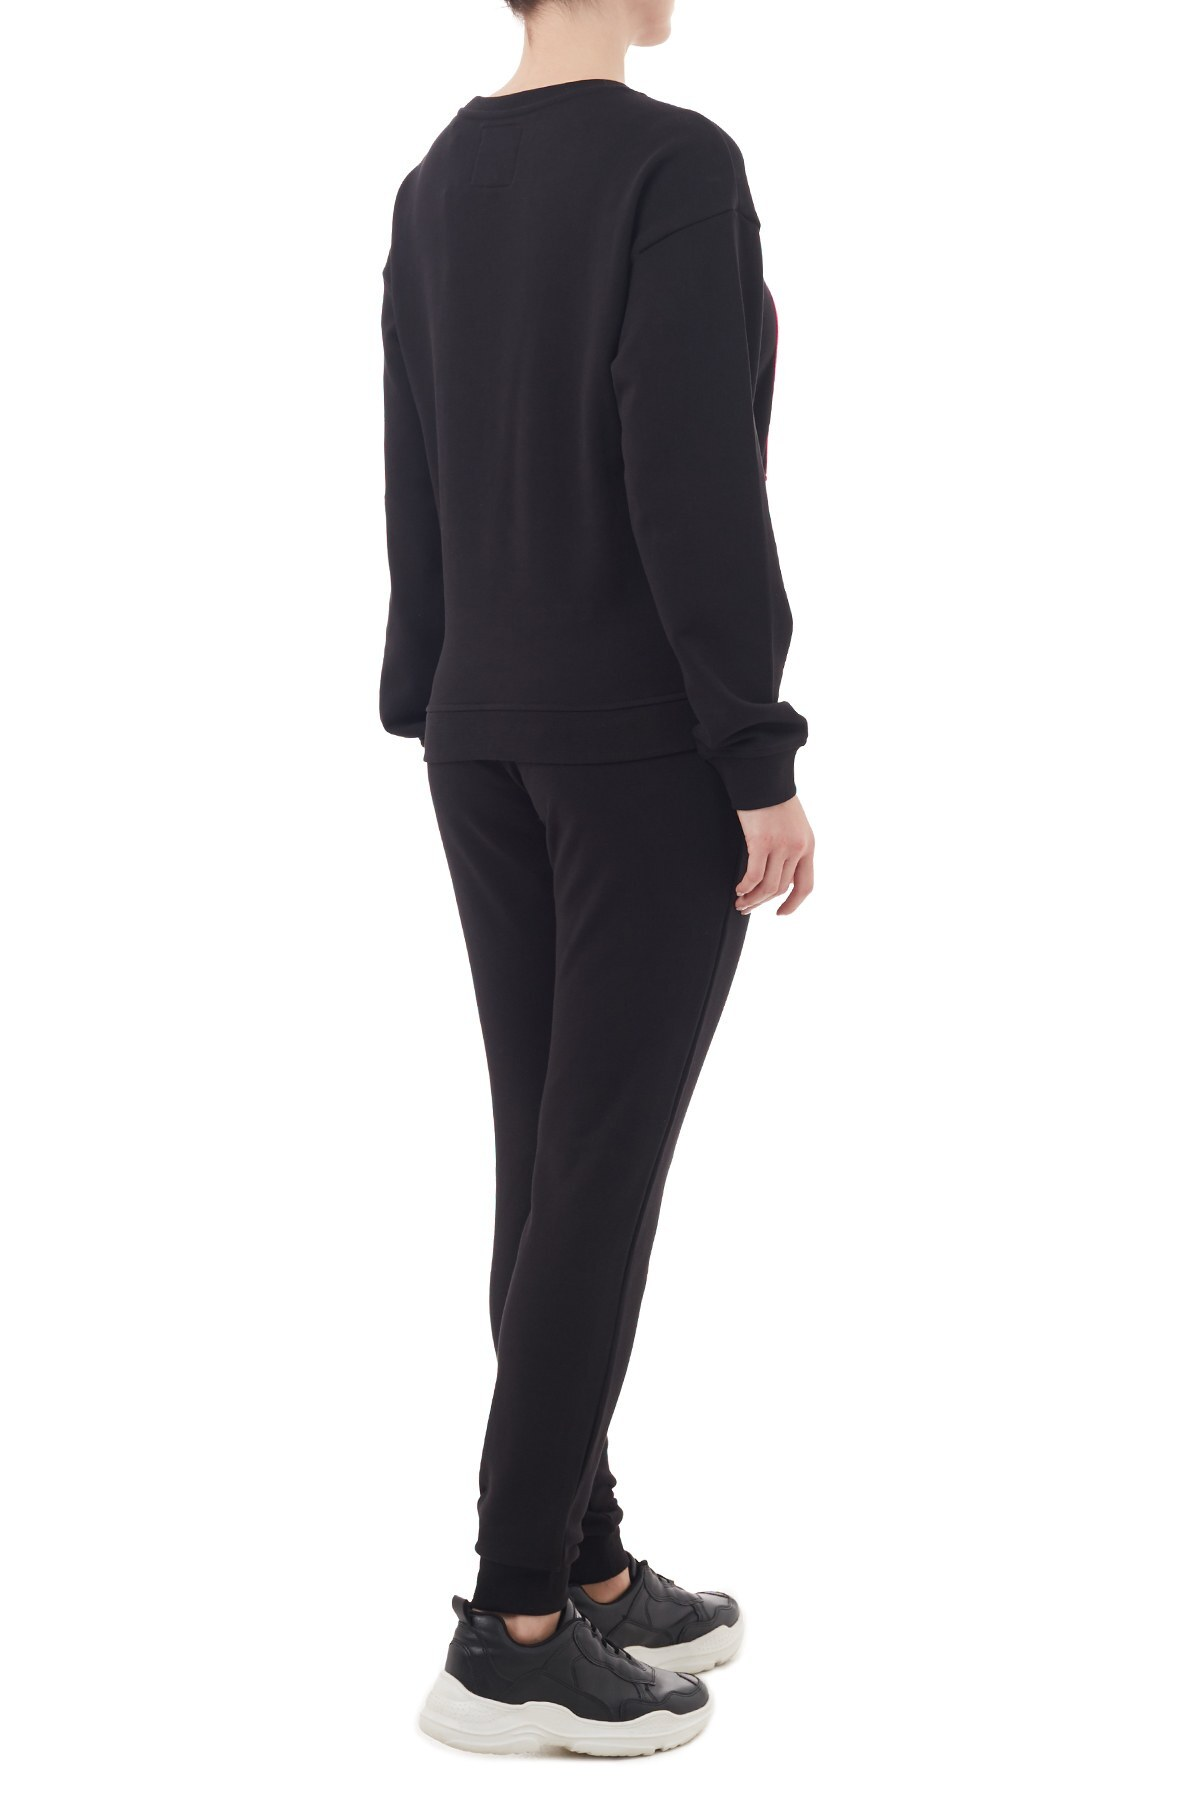 Armani Exchange % 100 Pamuklu Örme Jogger Kadın Eşofman Altı 8NYPCX YJ68Z 8219 SİYAH